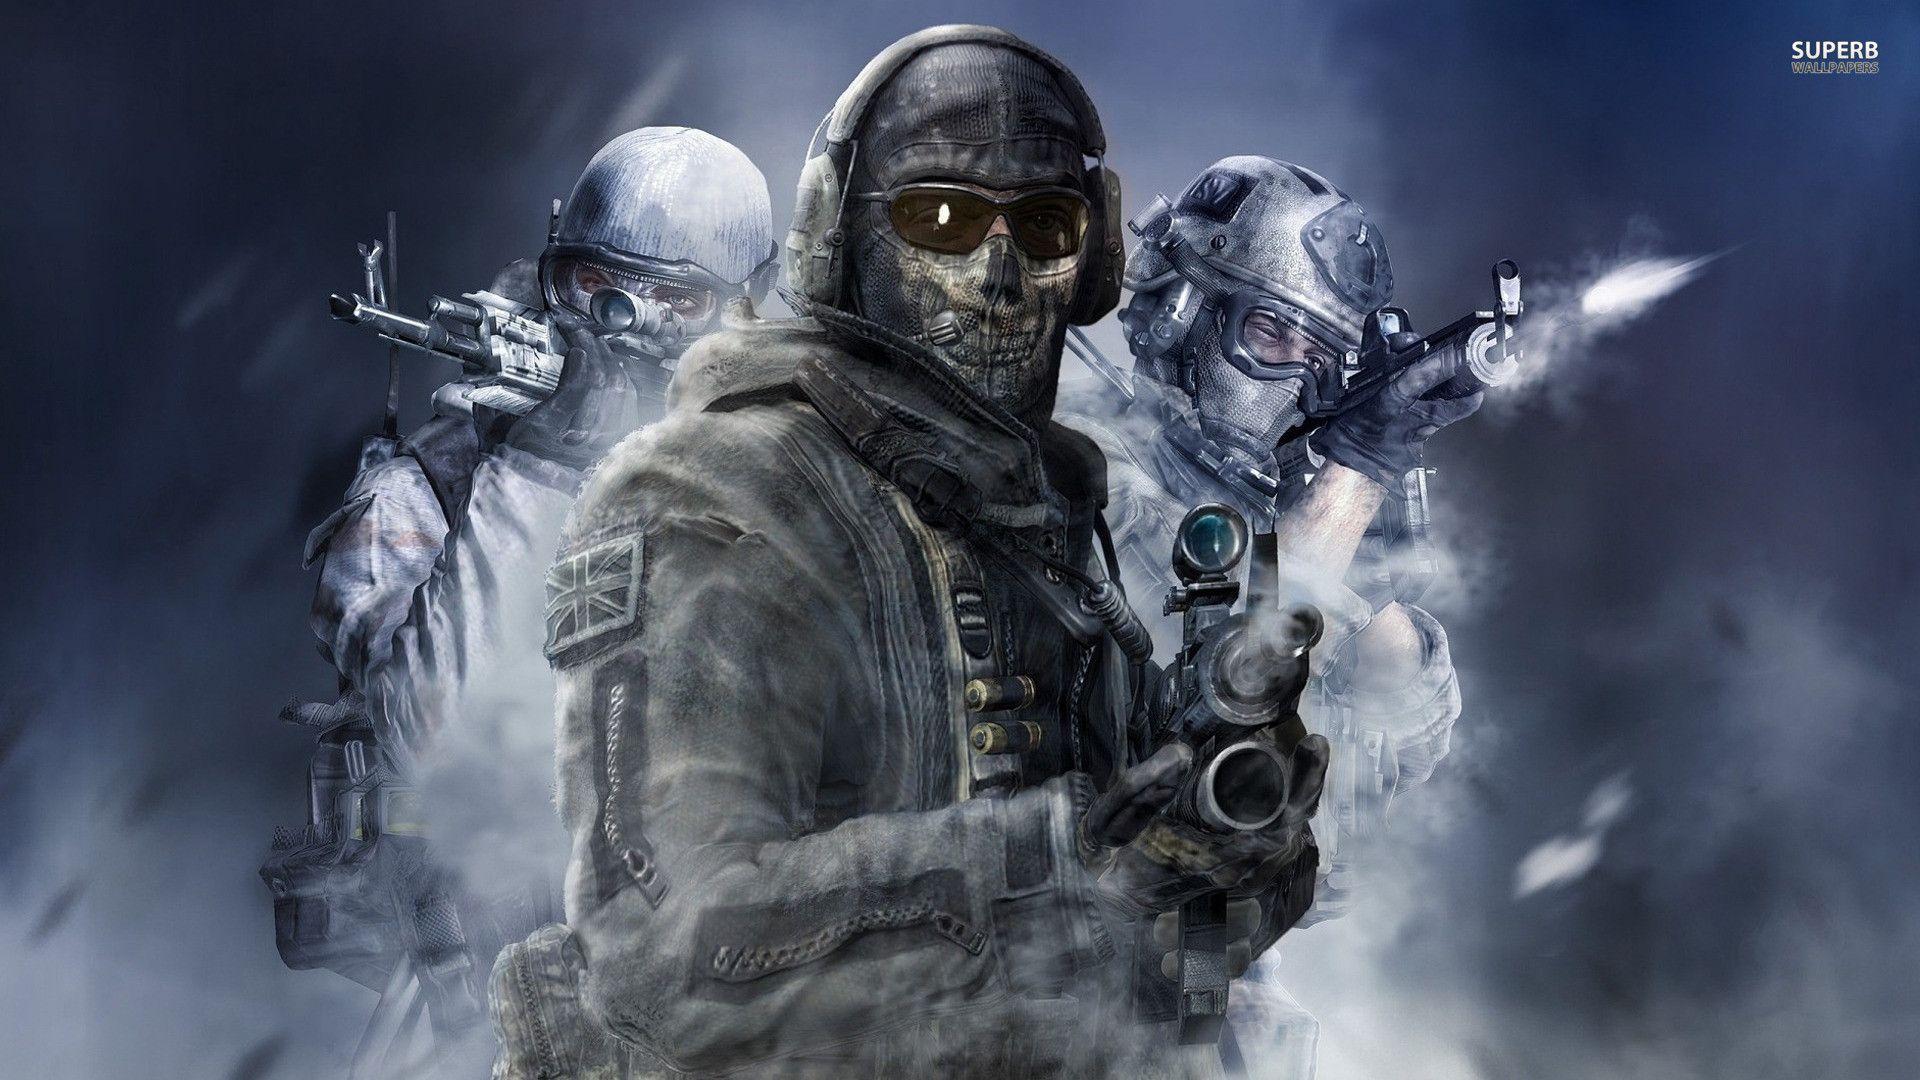 COD Black Ops 4 Wallpapers